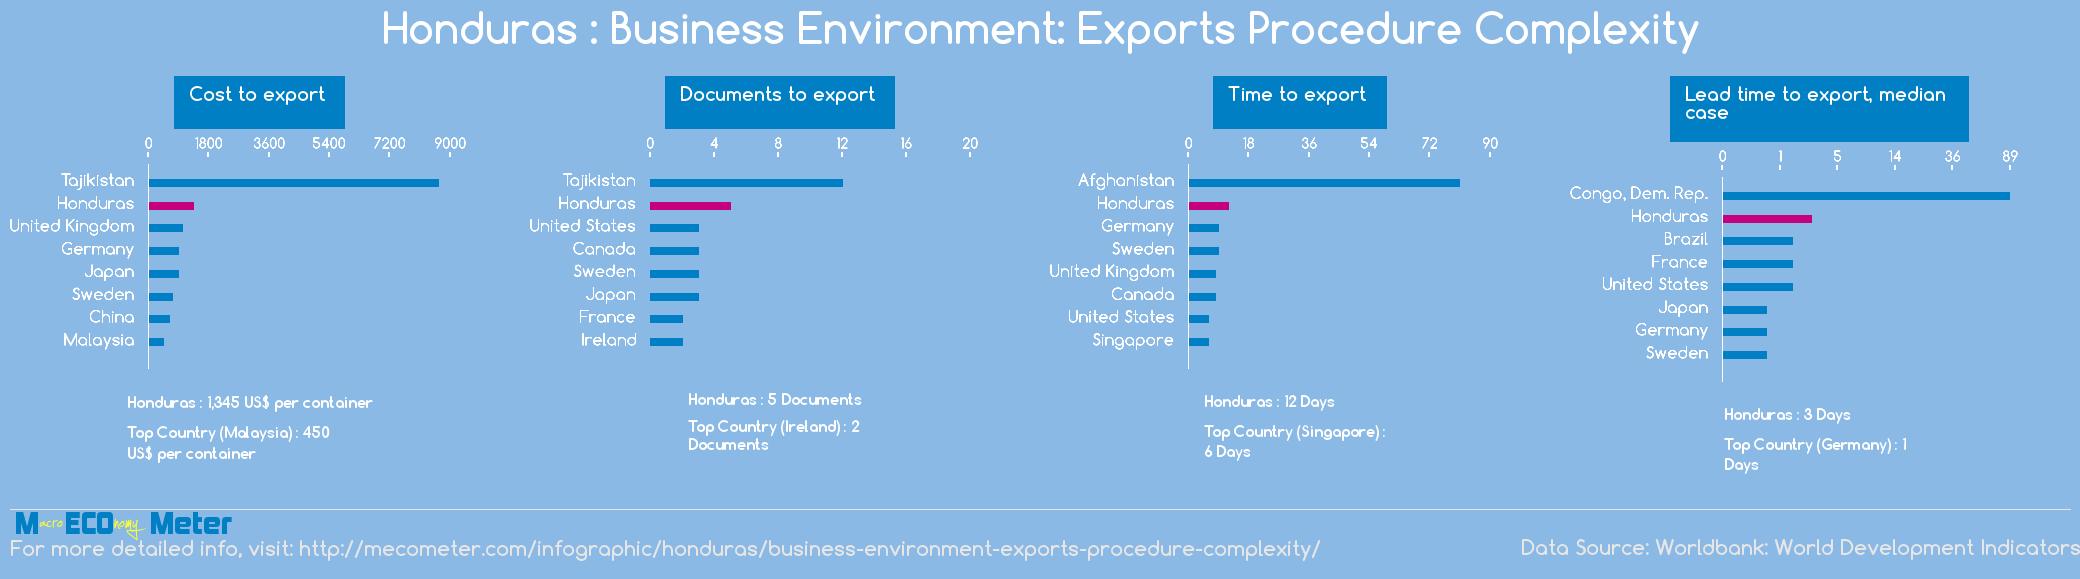 Honduras : Business Environment: Exports Procedure Complexity